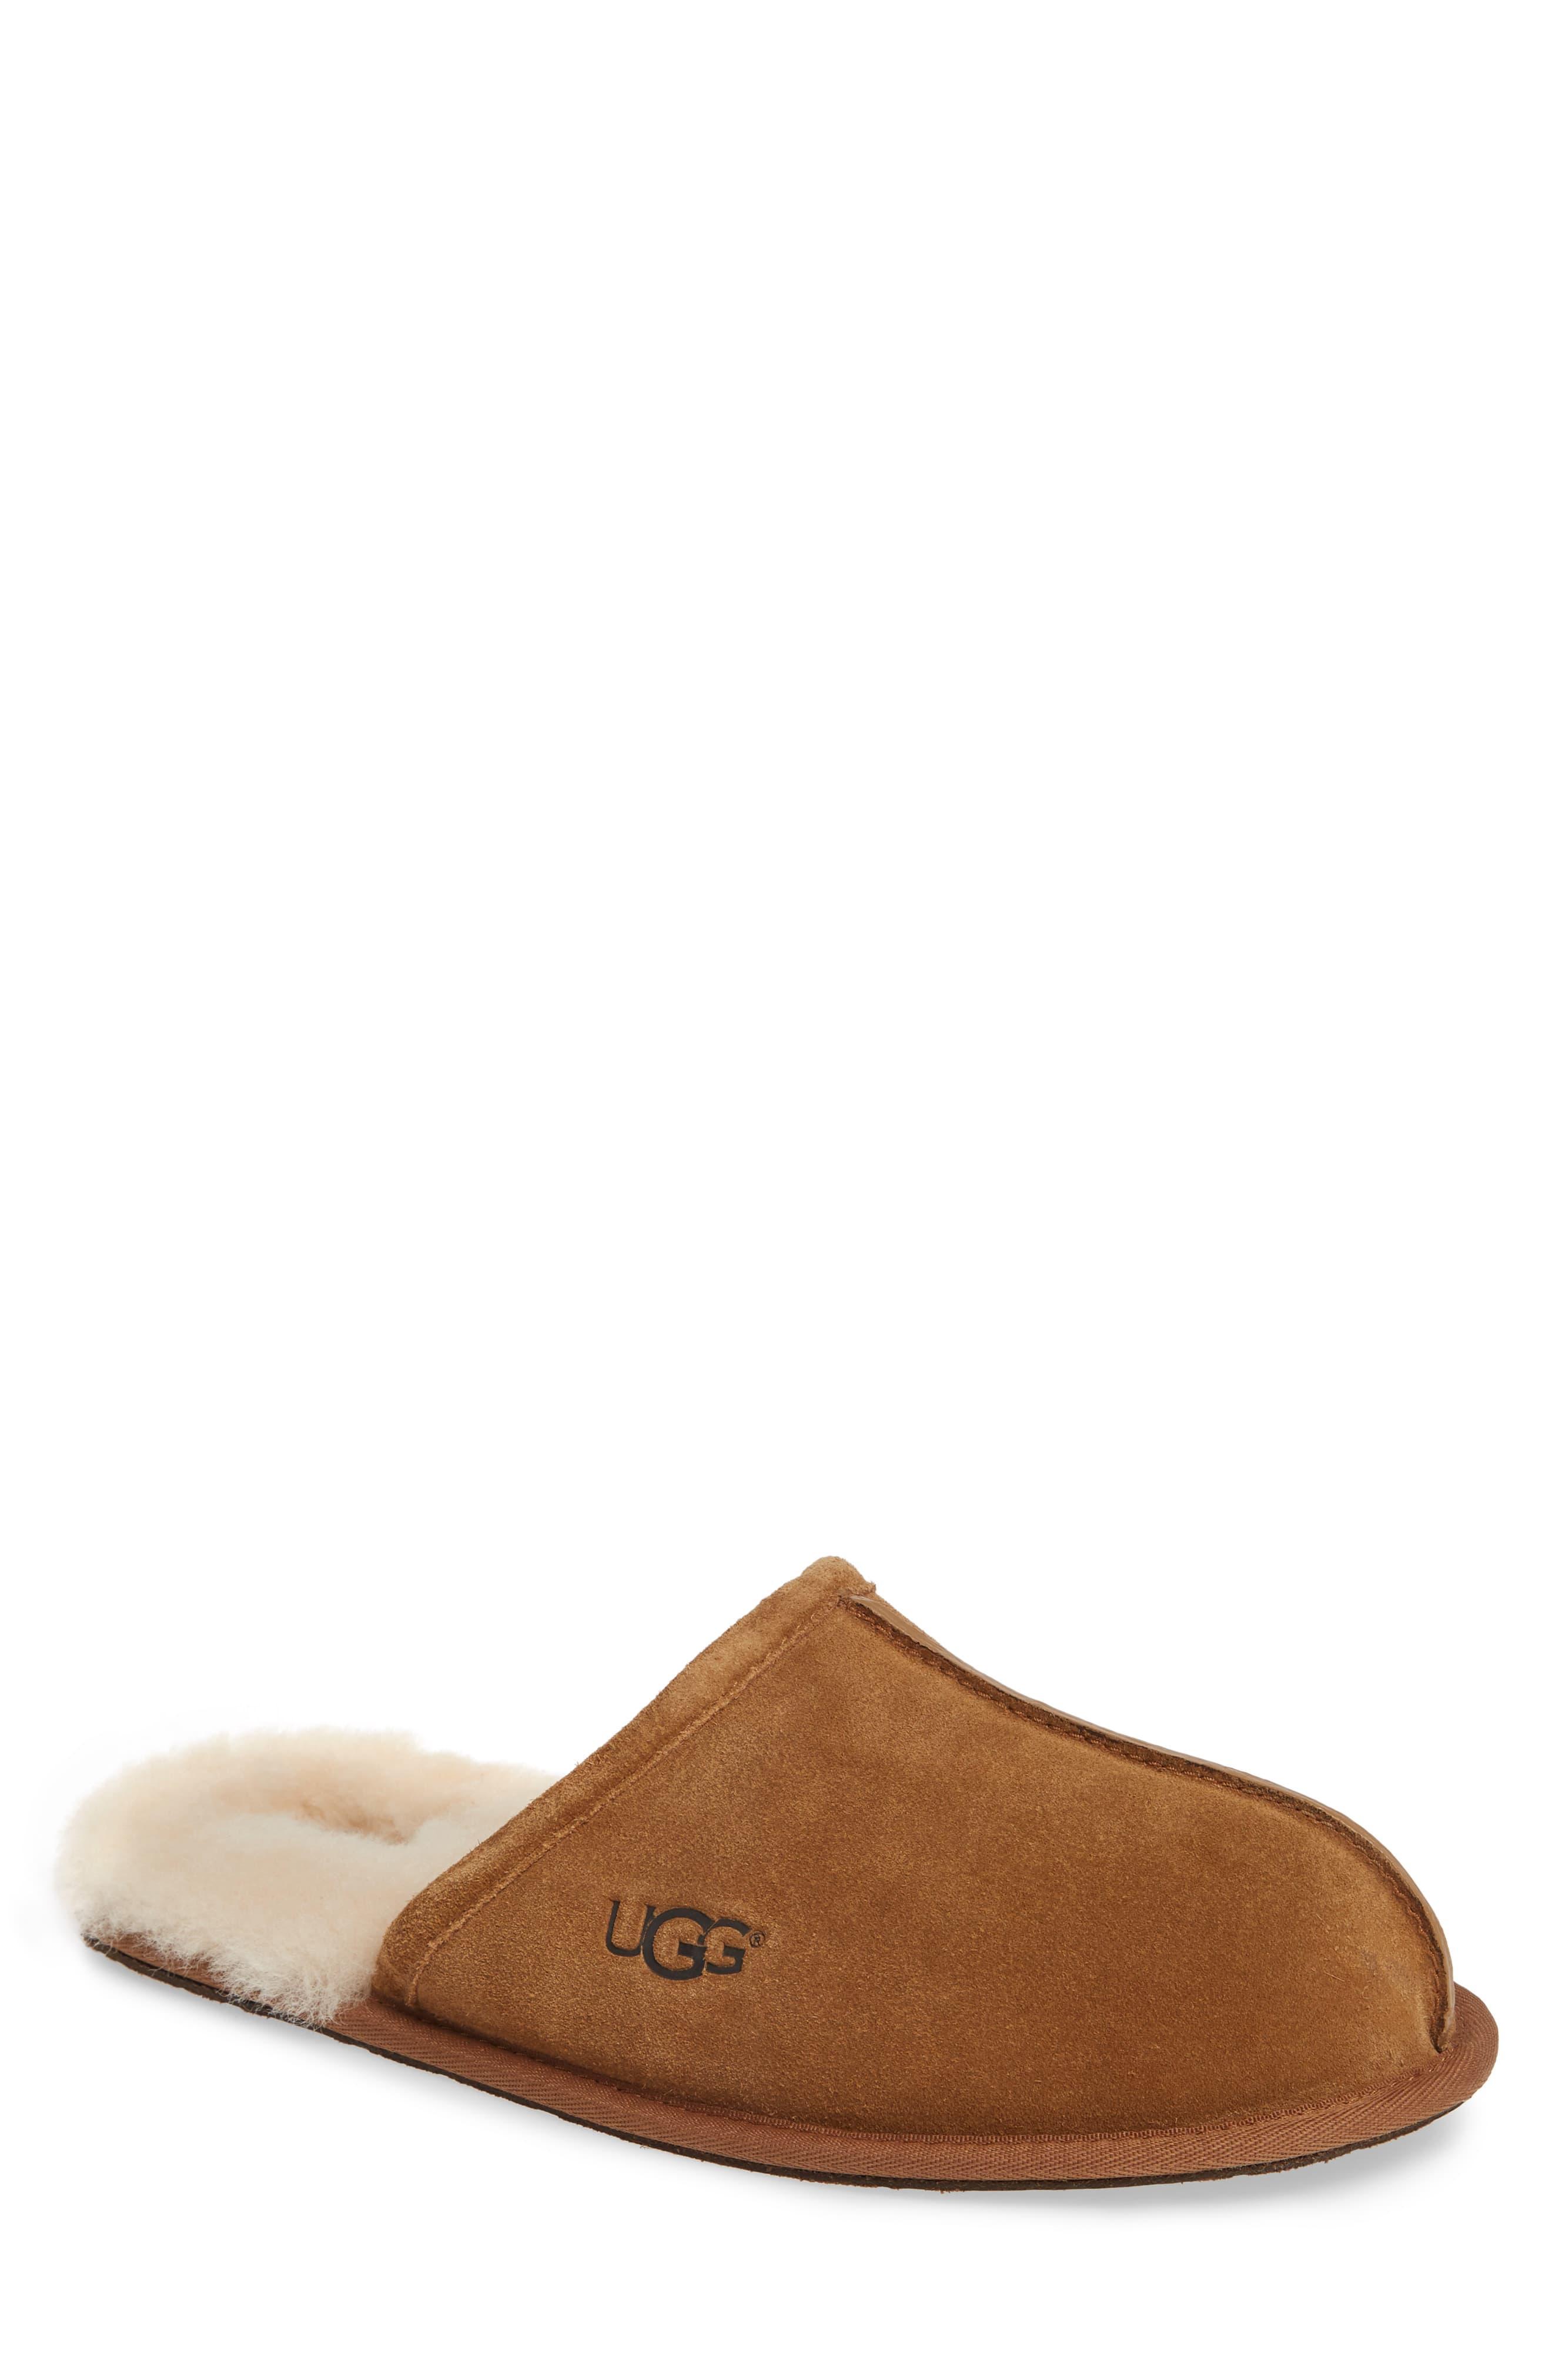 4e831928ef4 Men's Ugg Scuff Slipper, Size 16 M - Black in 2019 | Products | Mens ...